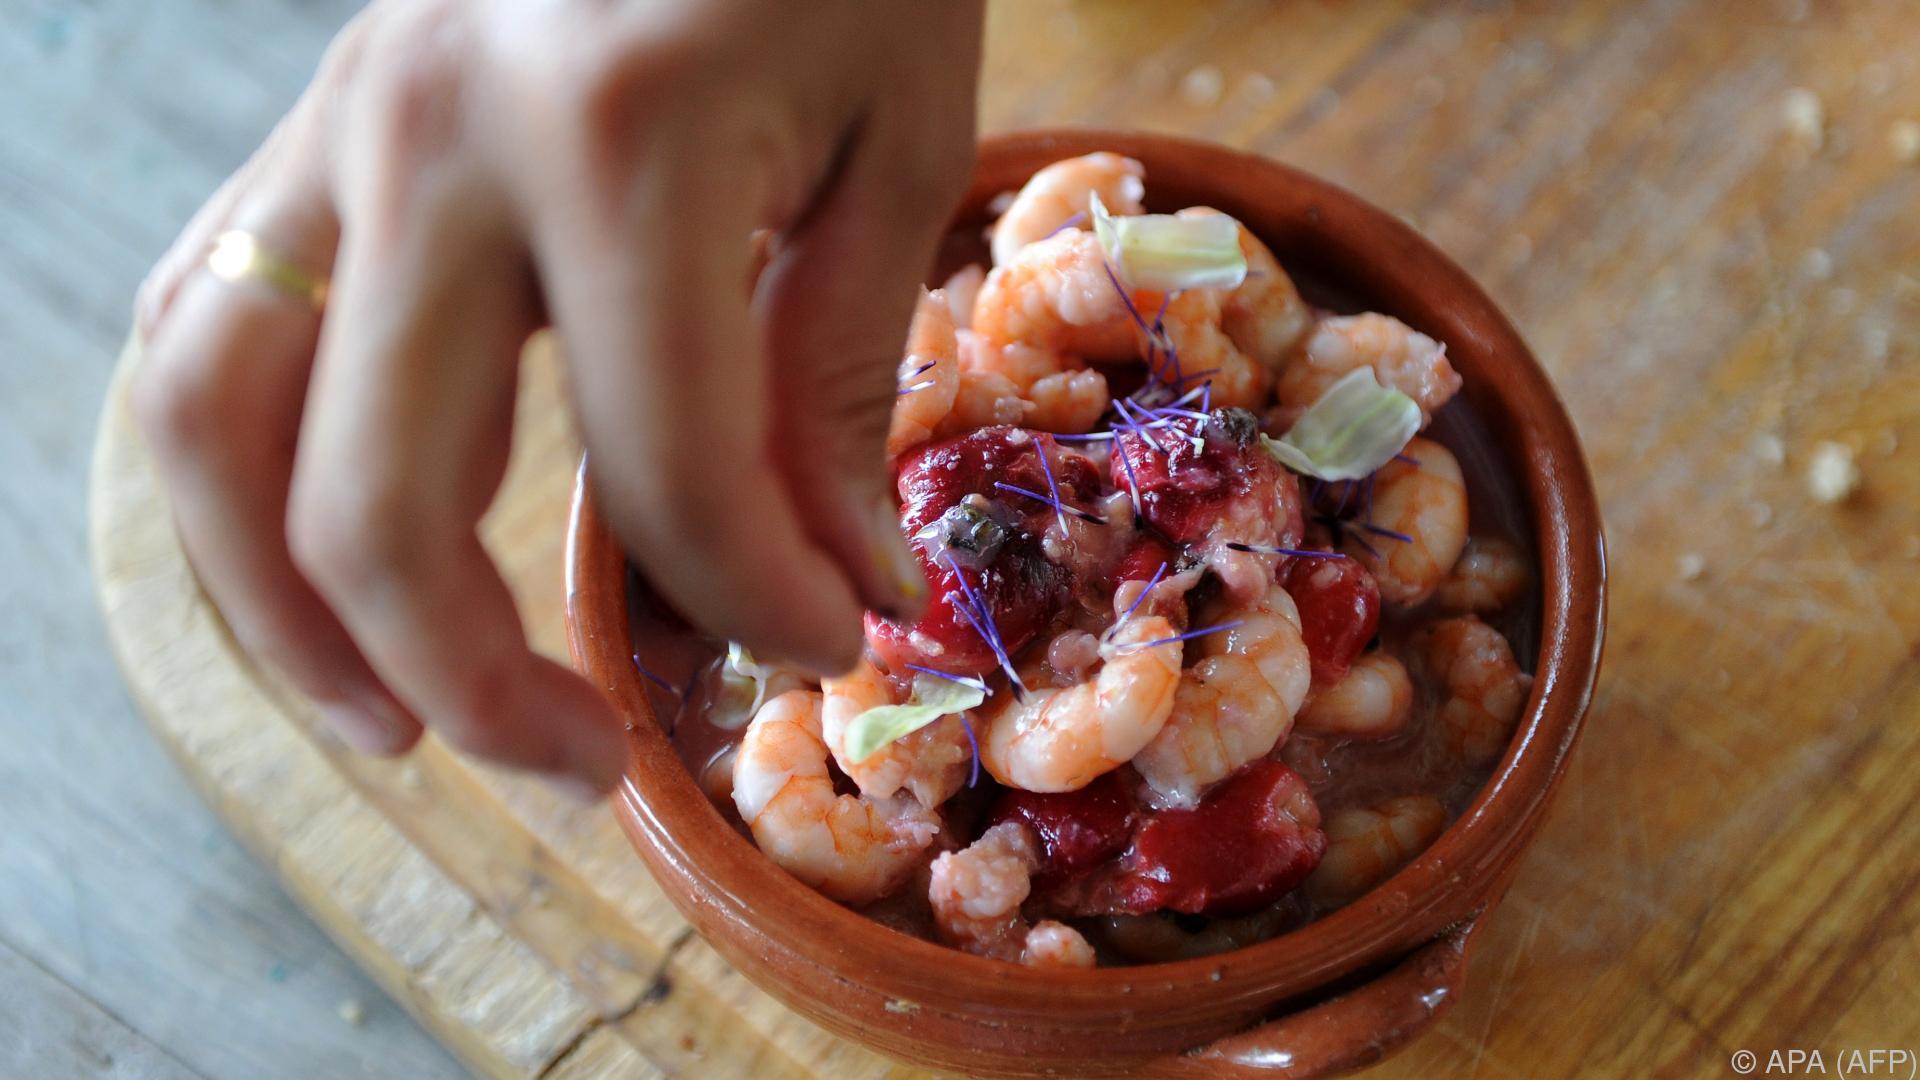 Bewusstes Essen tut dem Darm gut